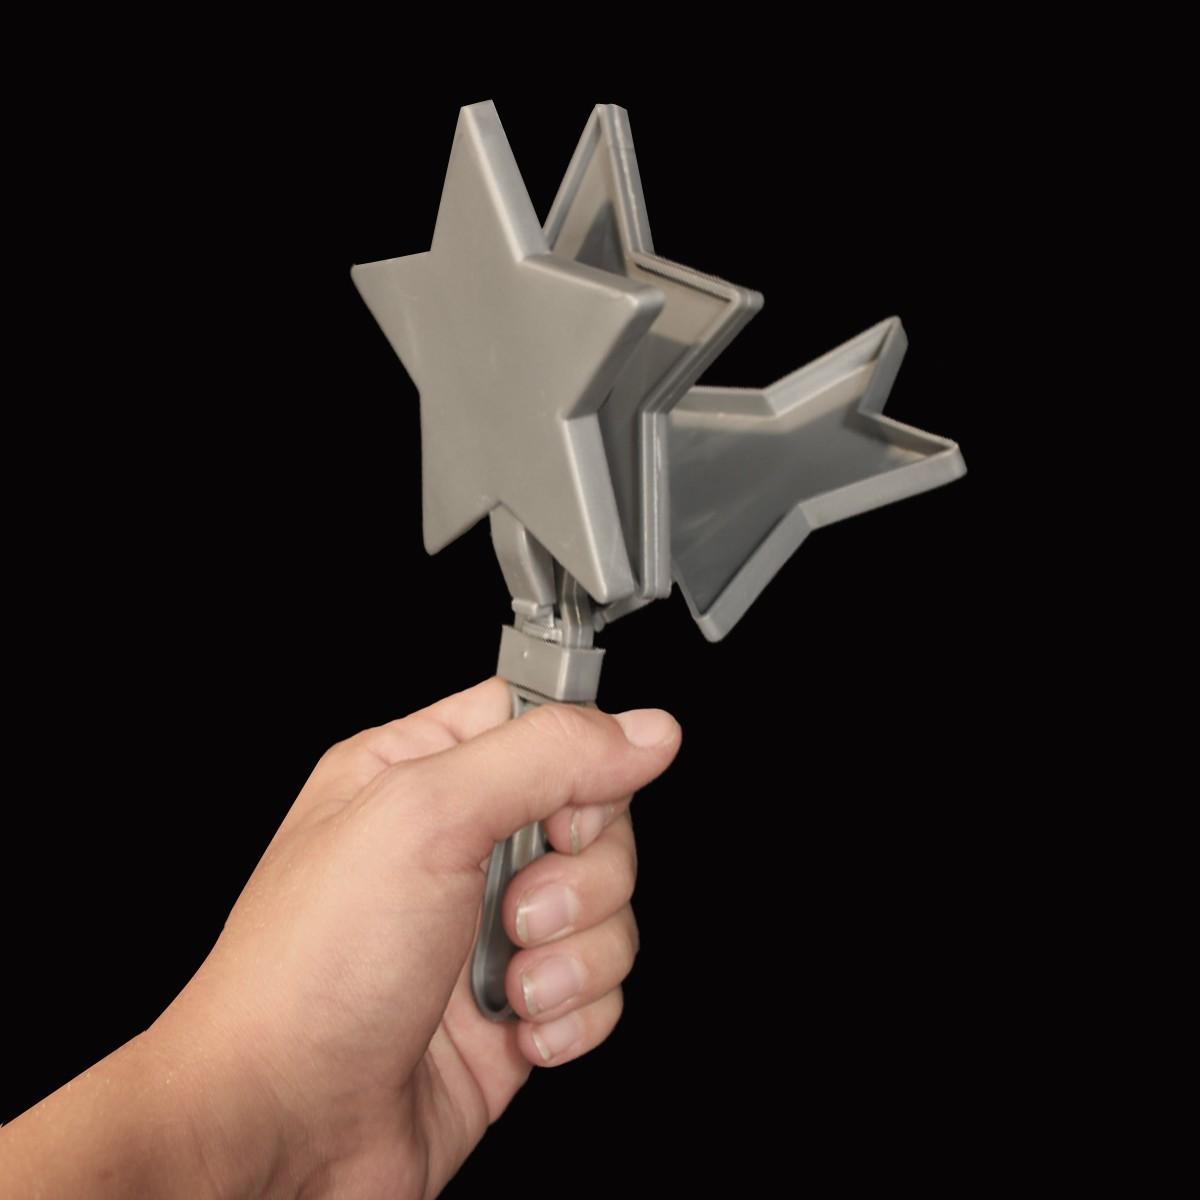 SILVER STAR CLAPPER